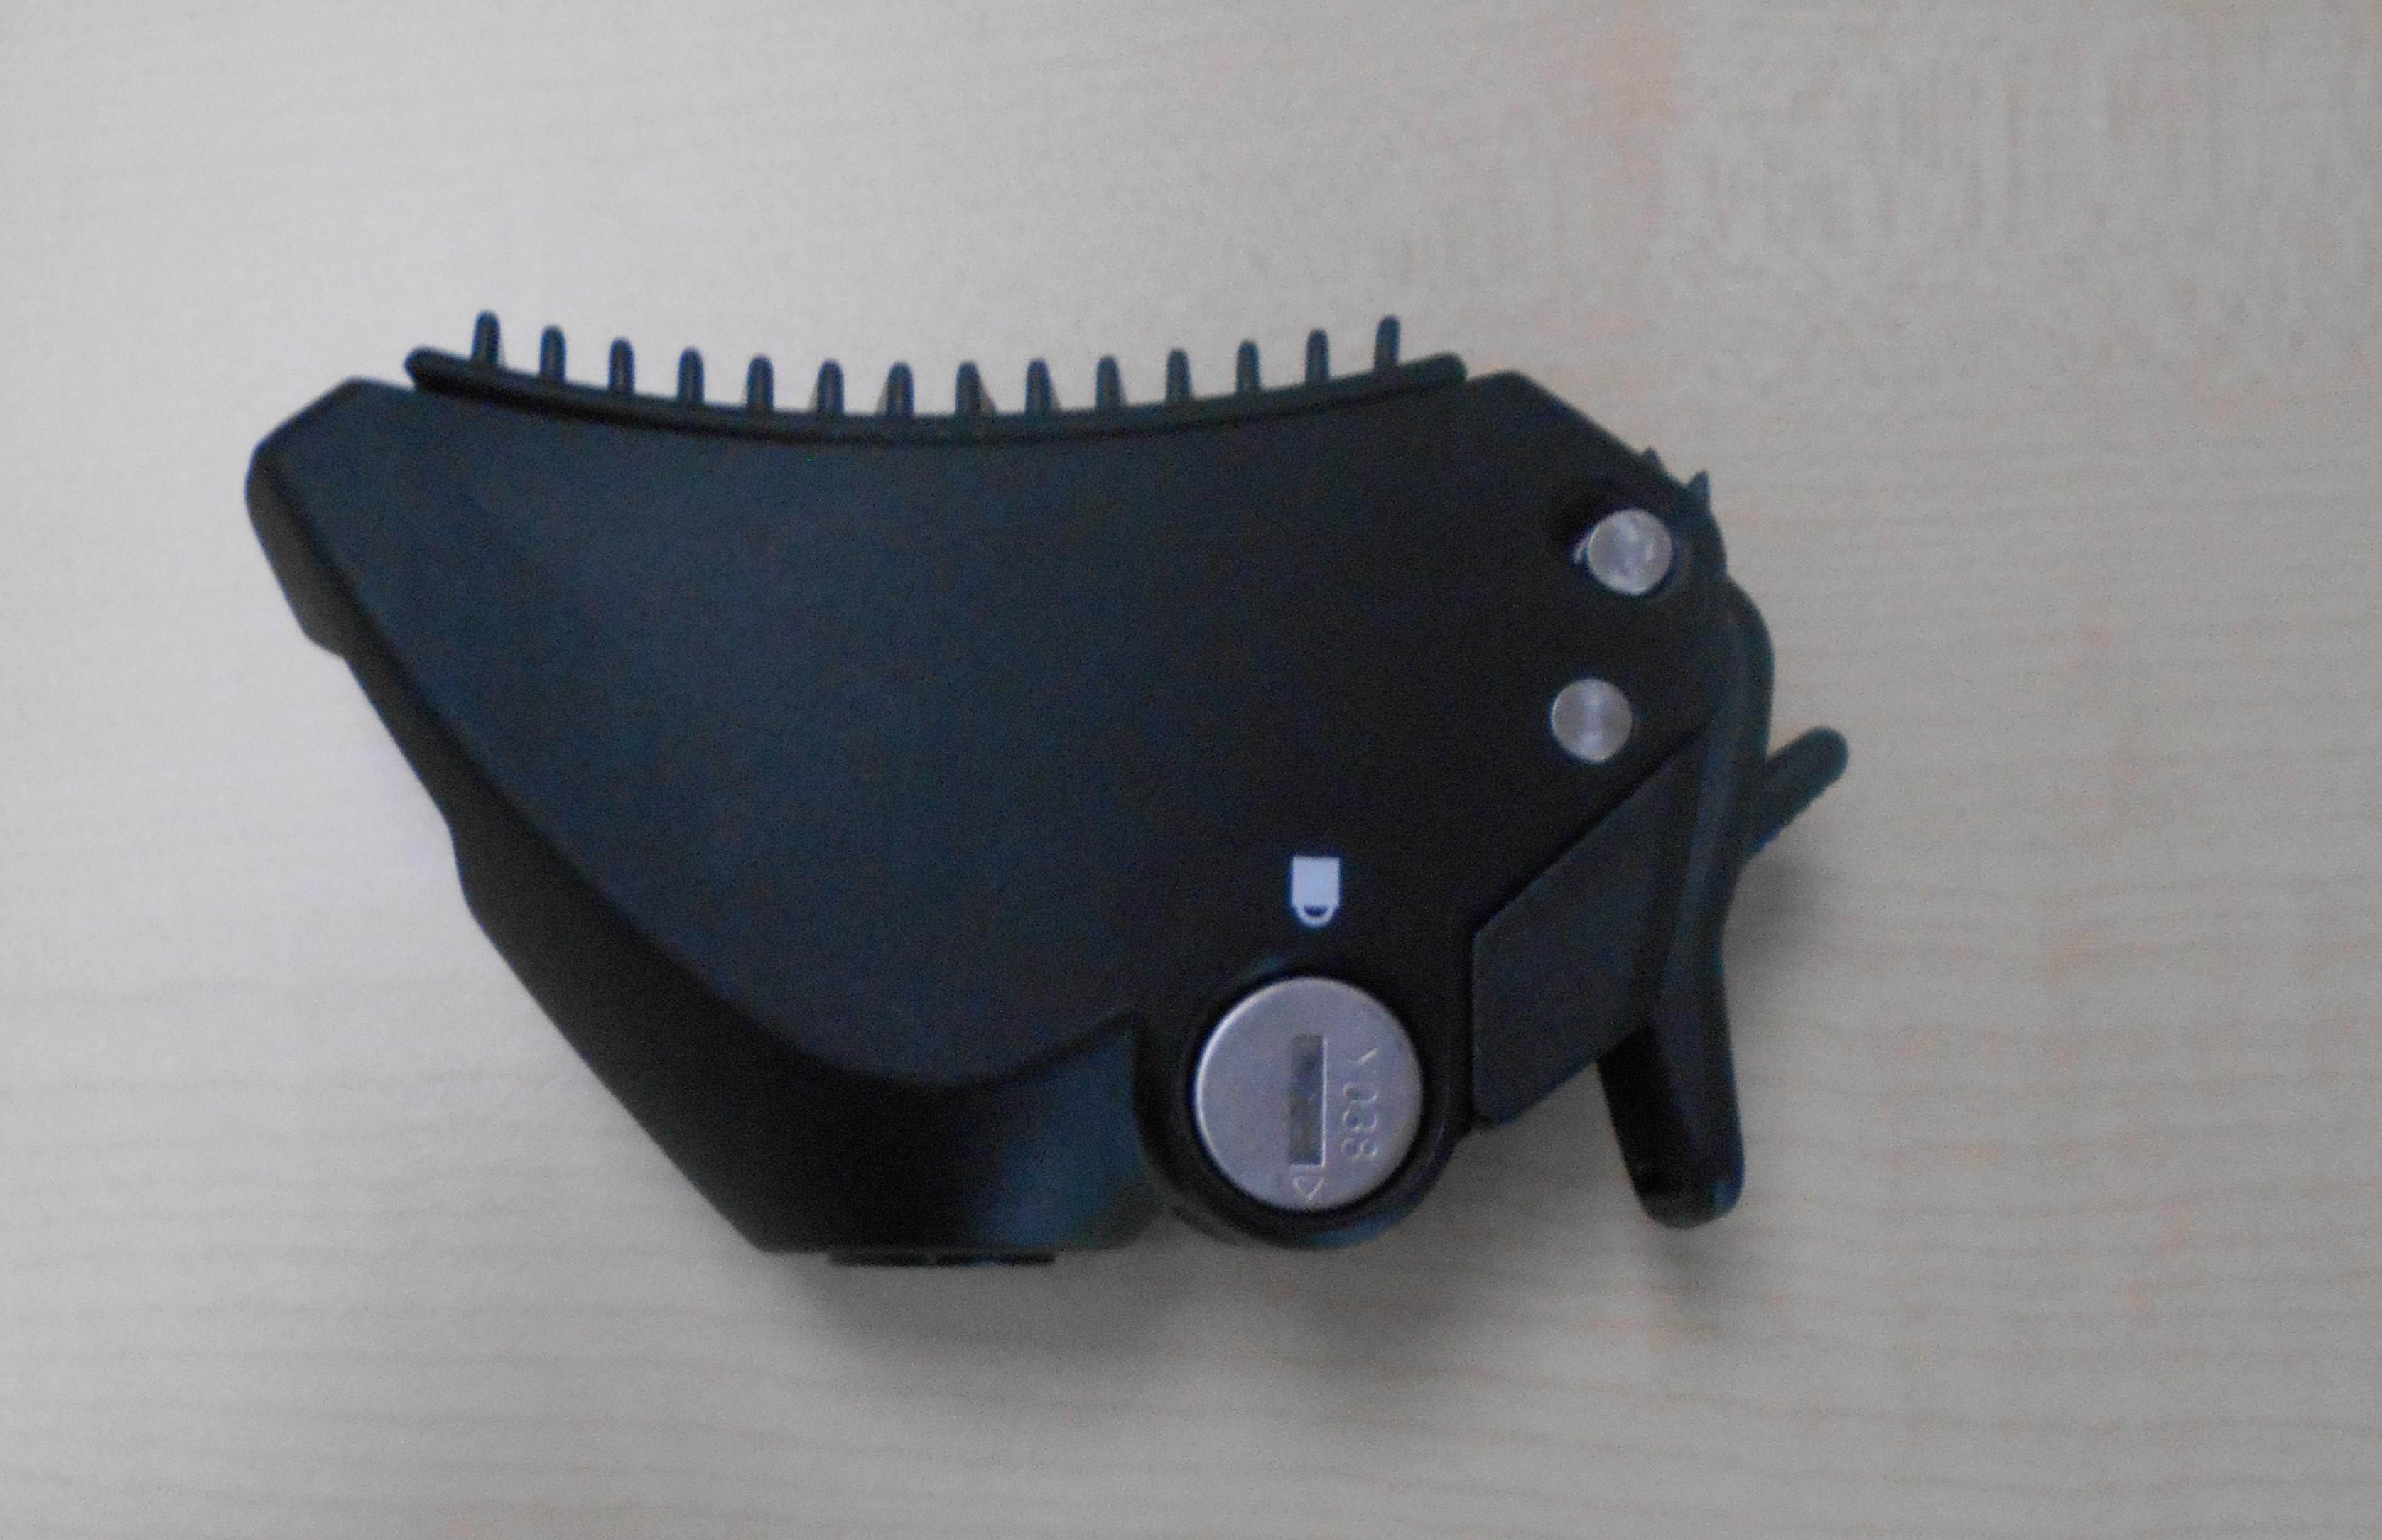 Kopf E-Bike Rahmenhalter mit Schlosscode Y001